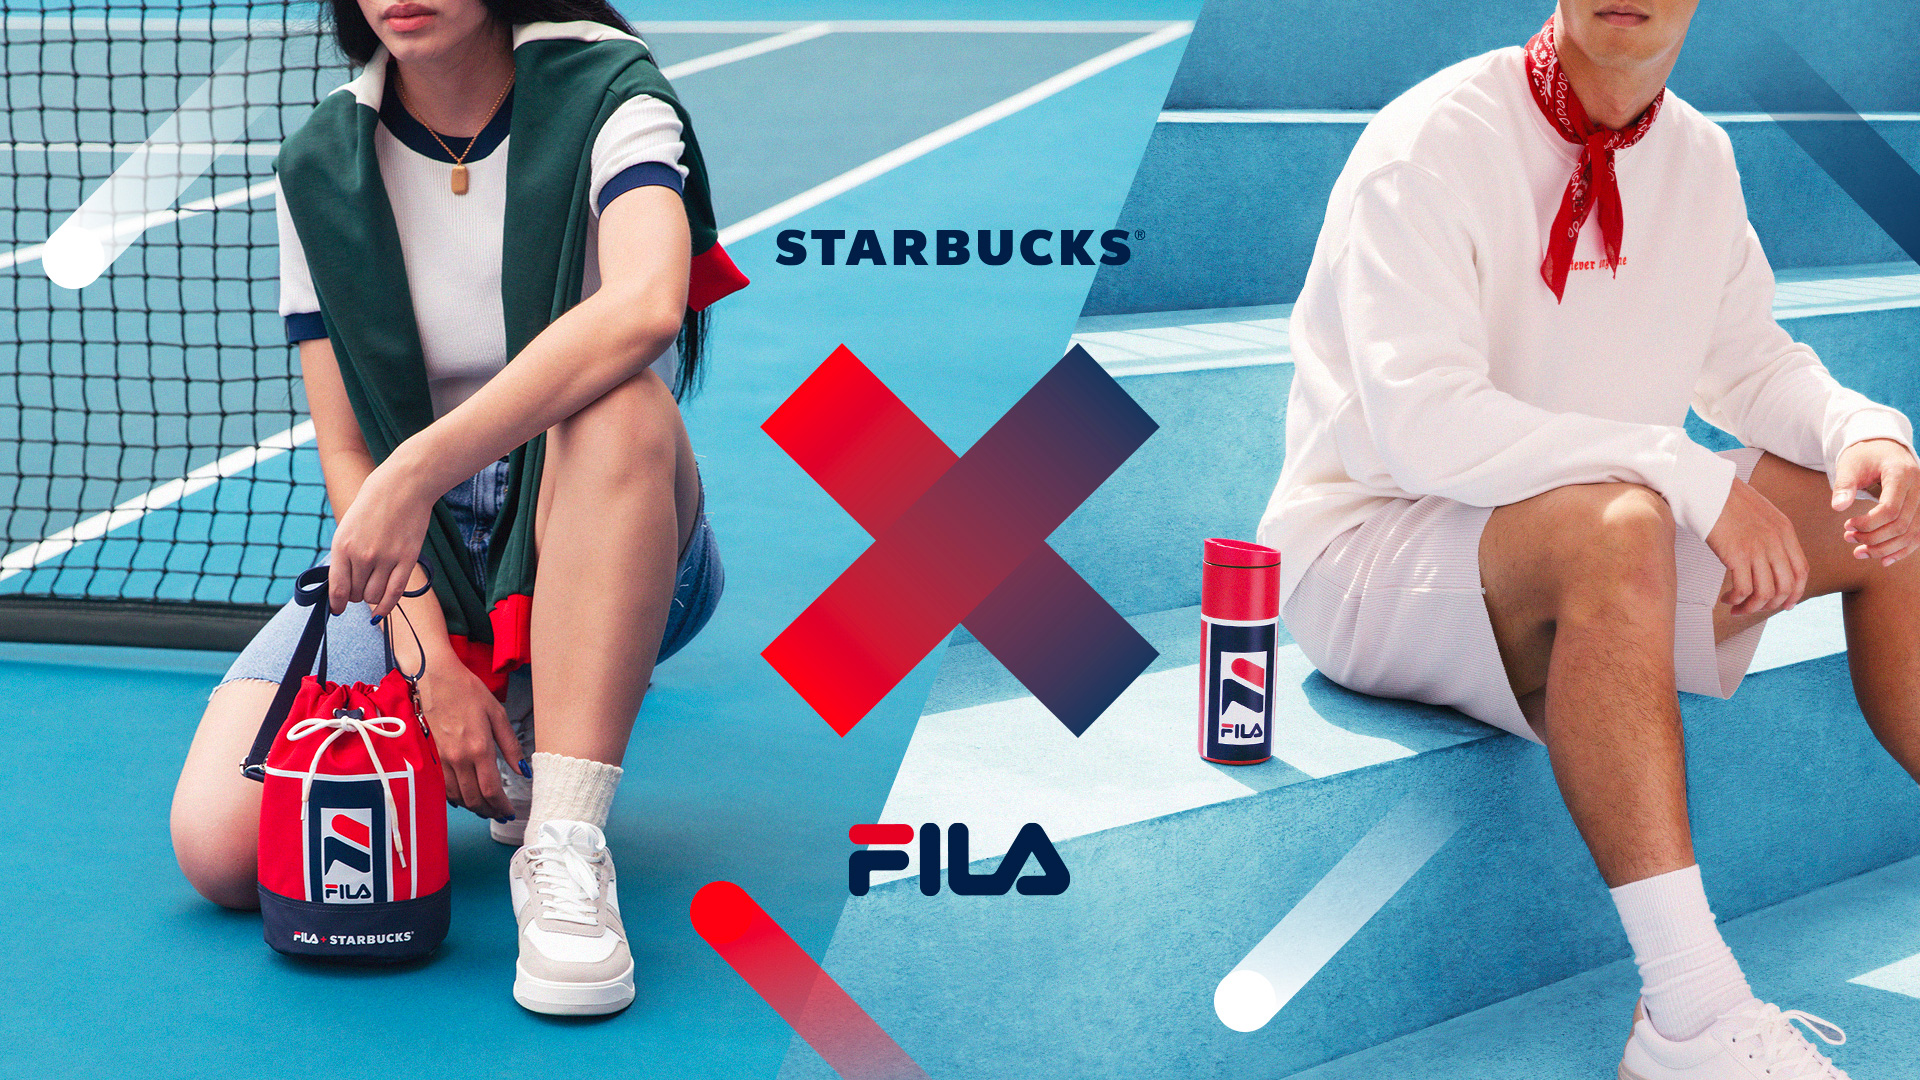 Save Fila as Collab_Final.sbux